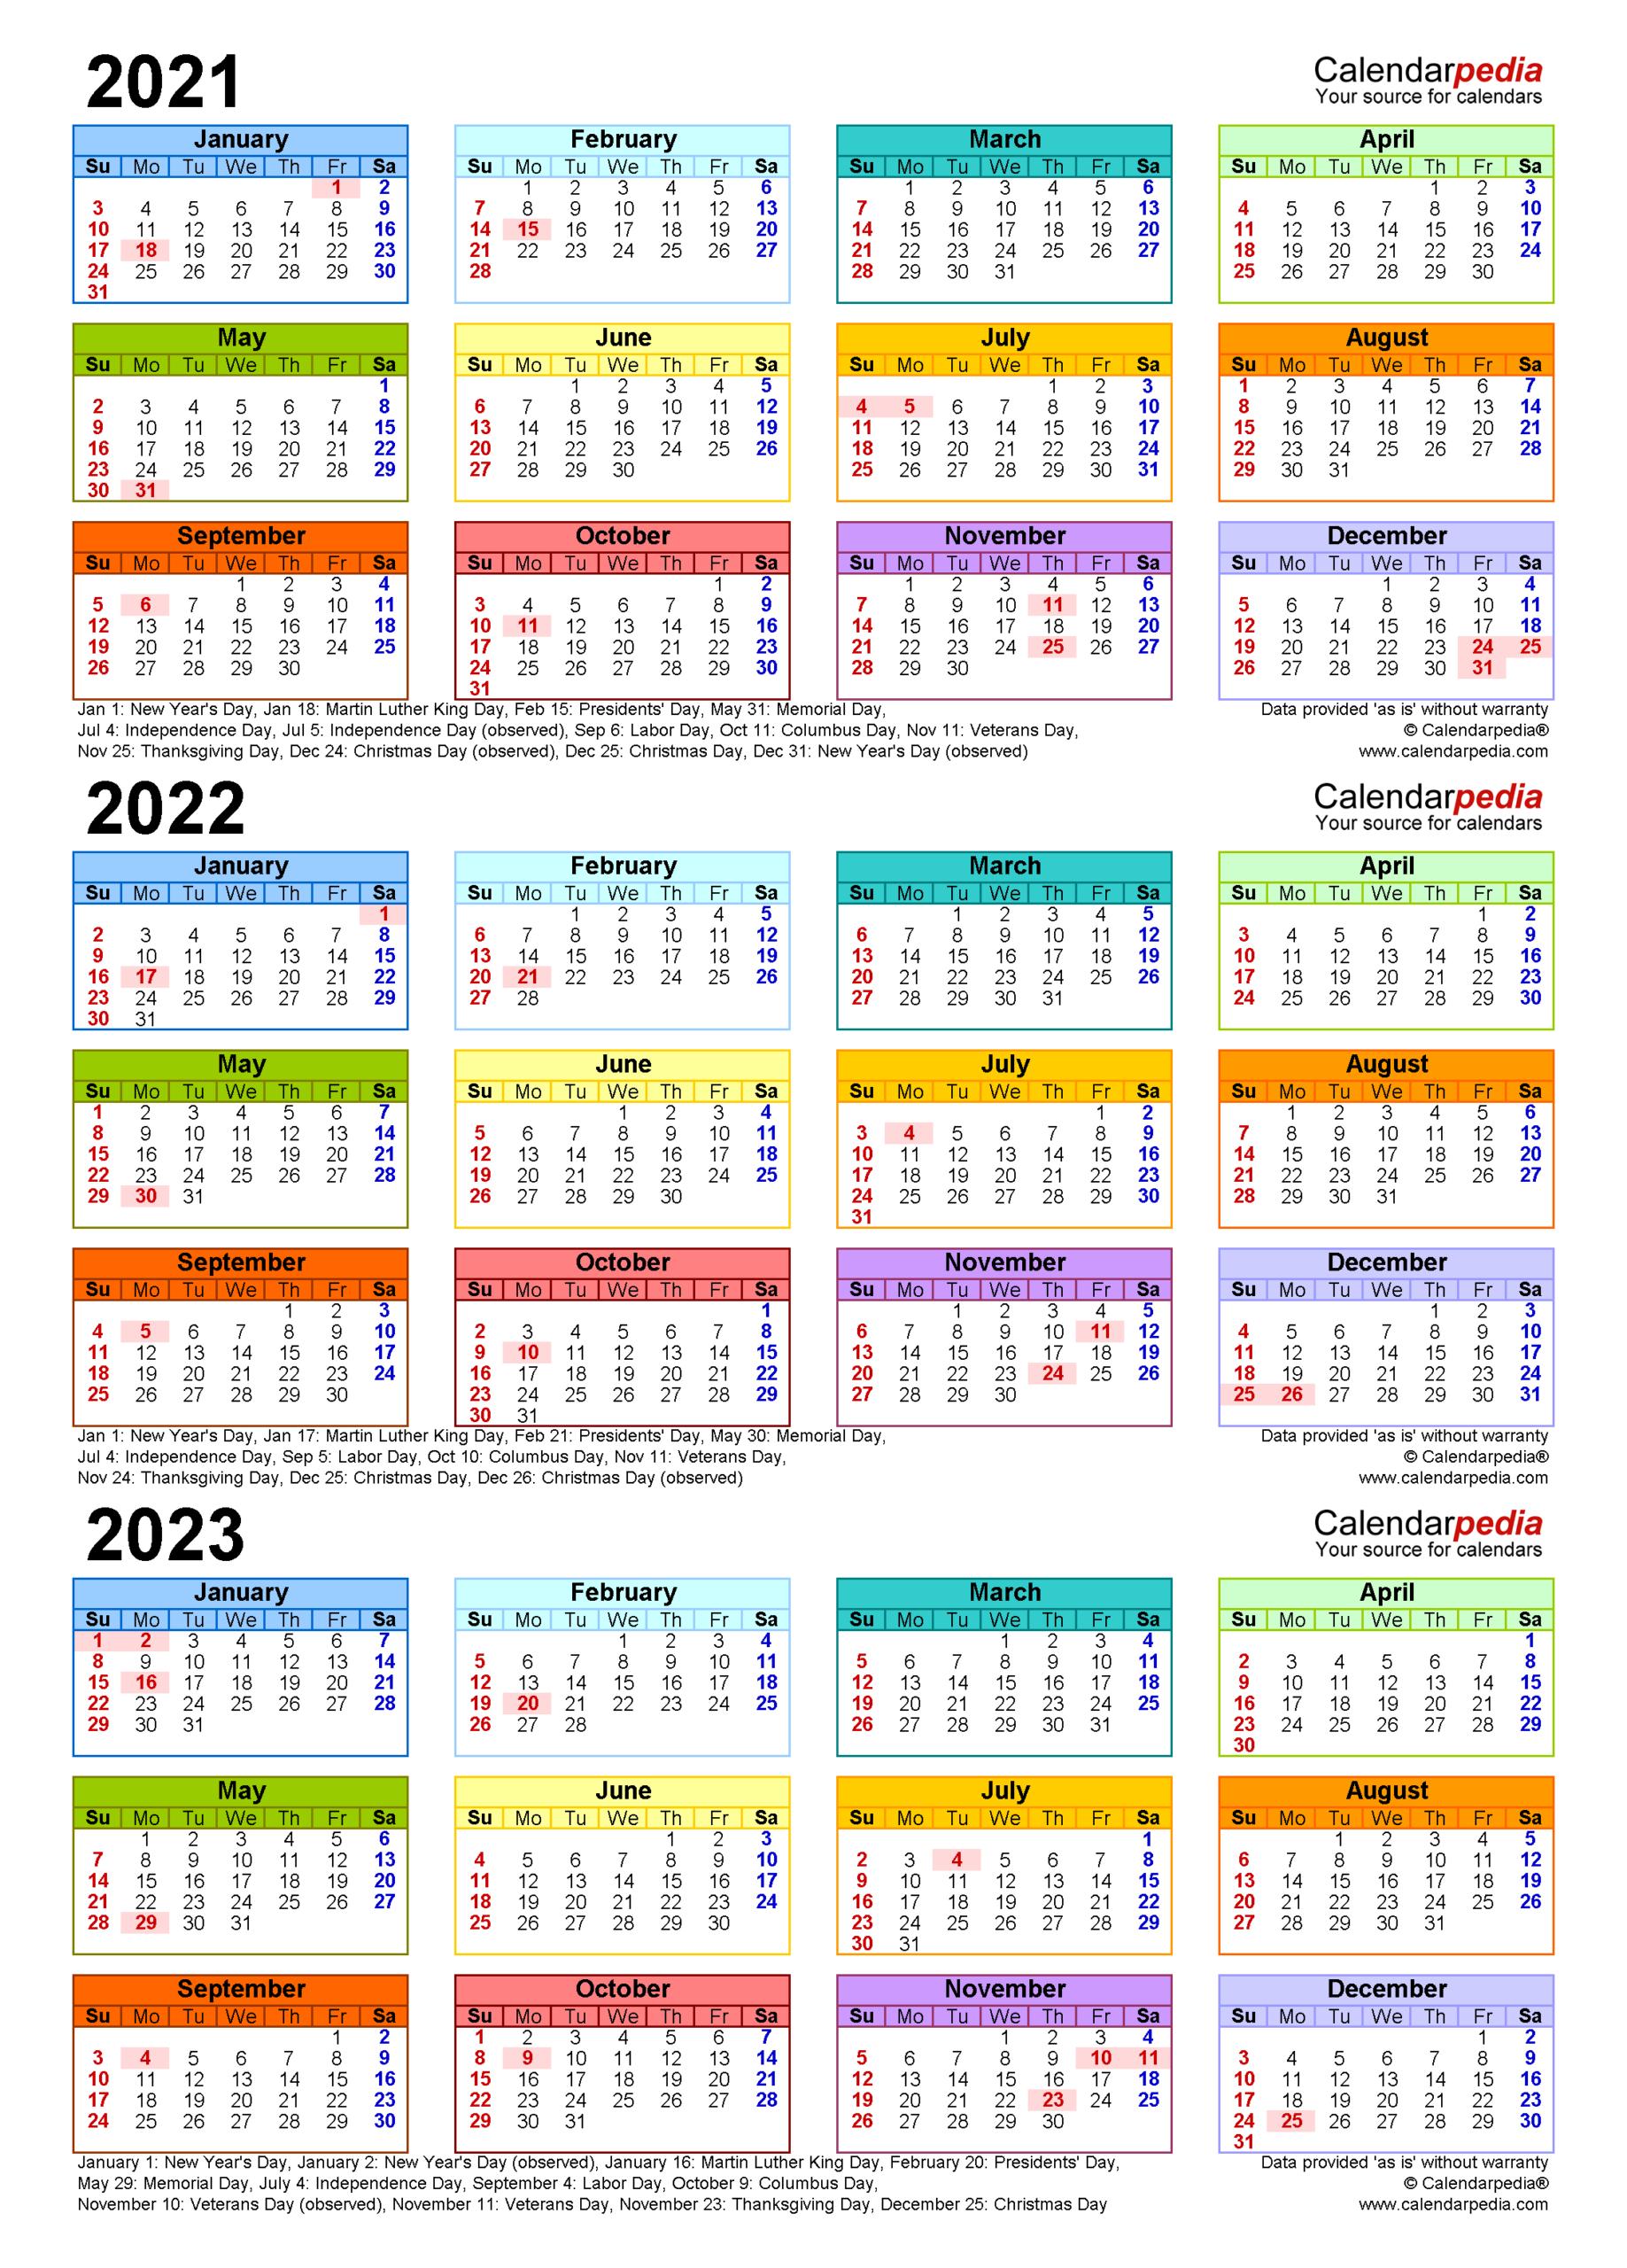 2021-2023 Three Year Calendar - Free Printable Pdf Templates for 2021 - 2023 Four Year Monthly Calendar